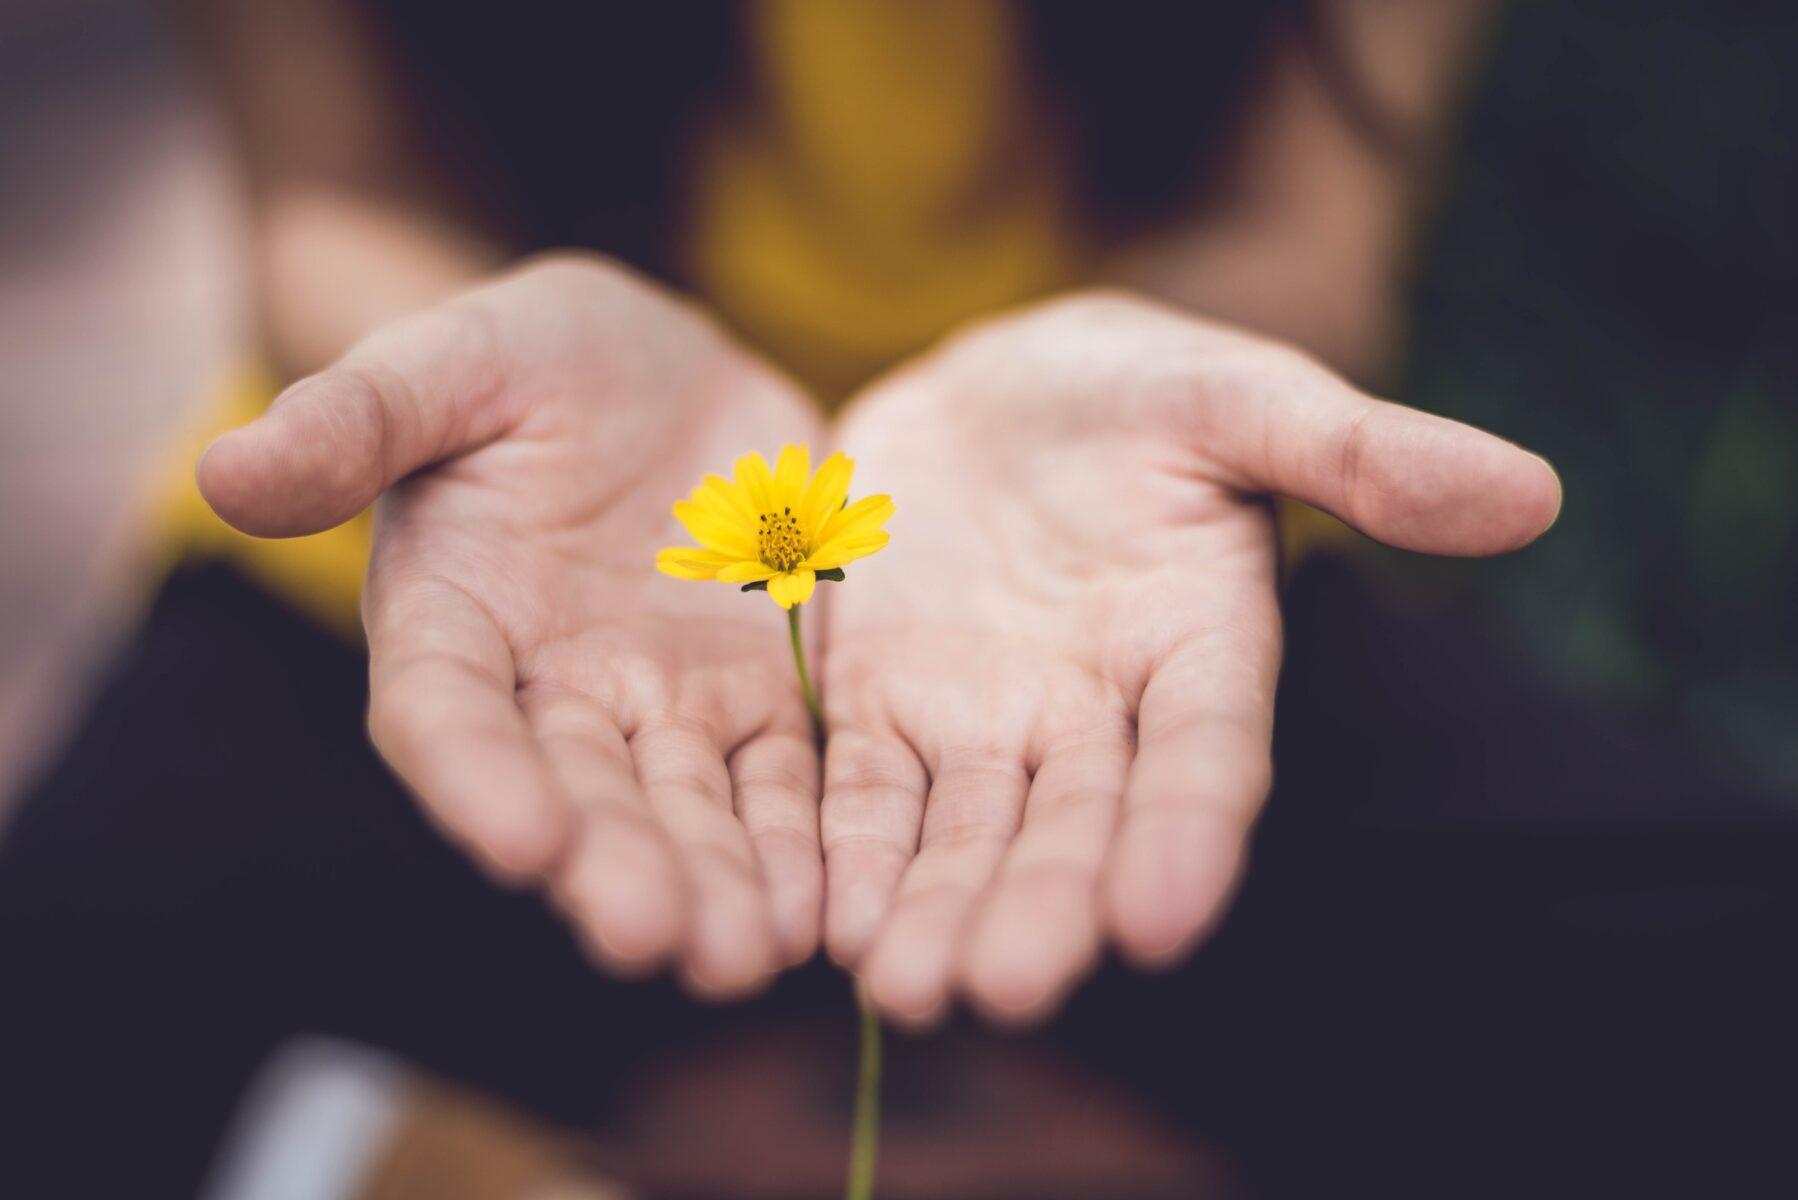 lina-trochez-forgive others